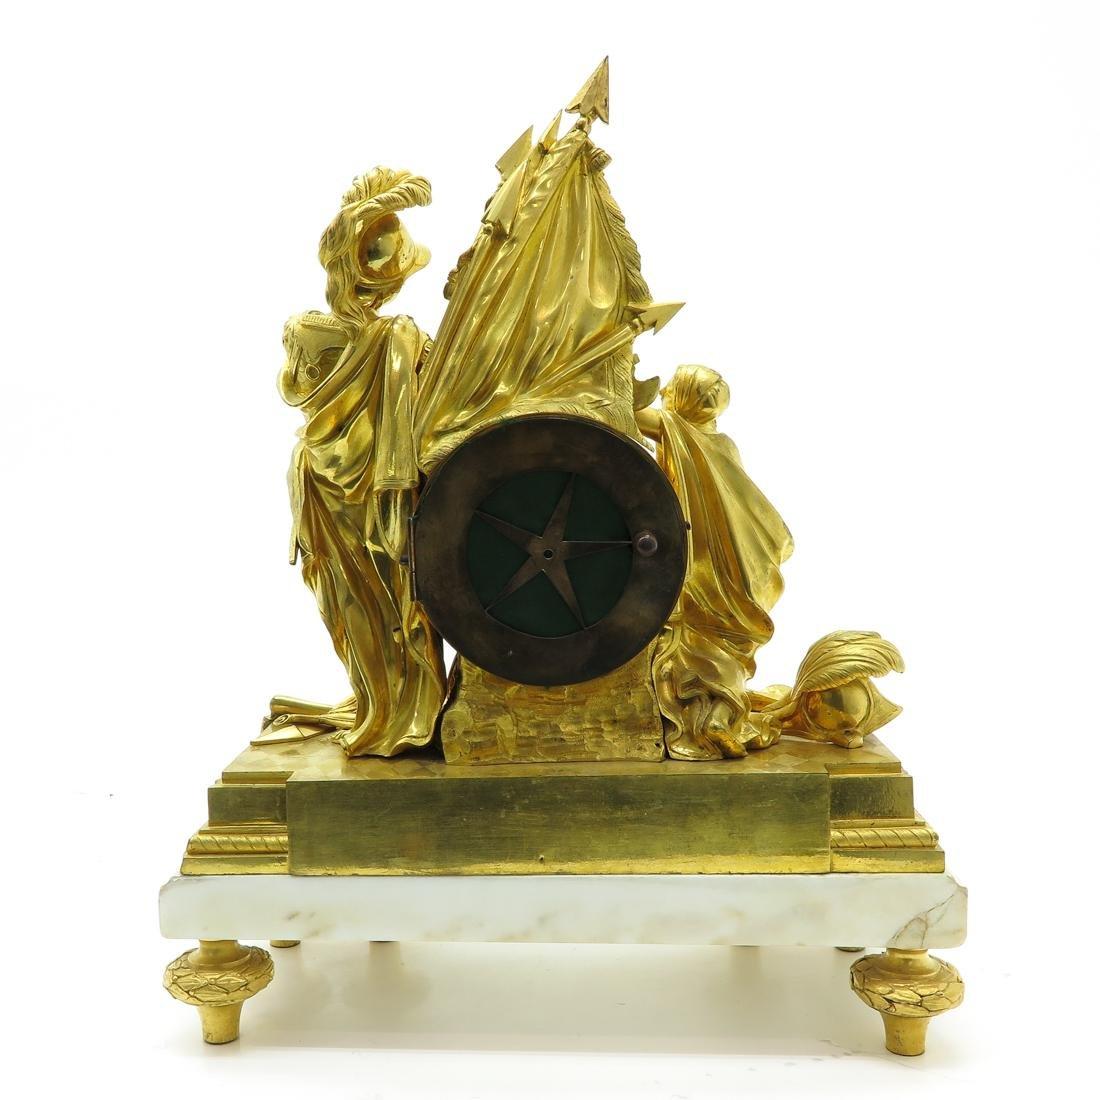 French Pendule Circa 1760 Signed Louis Goret Paris - 3